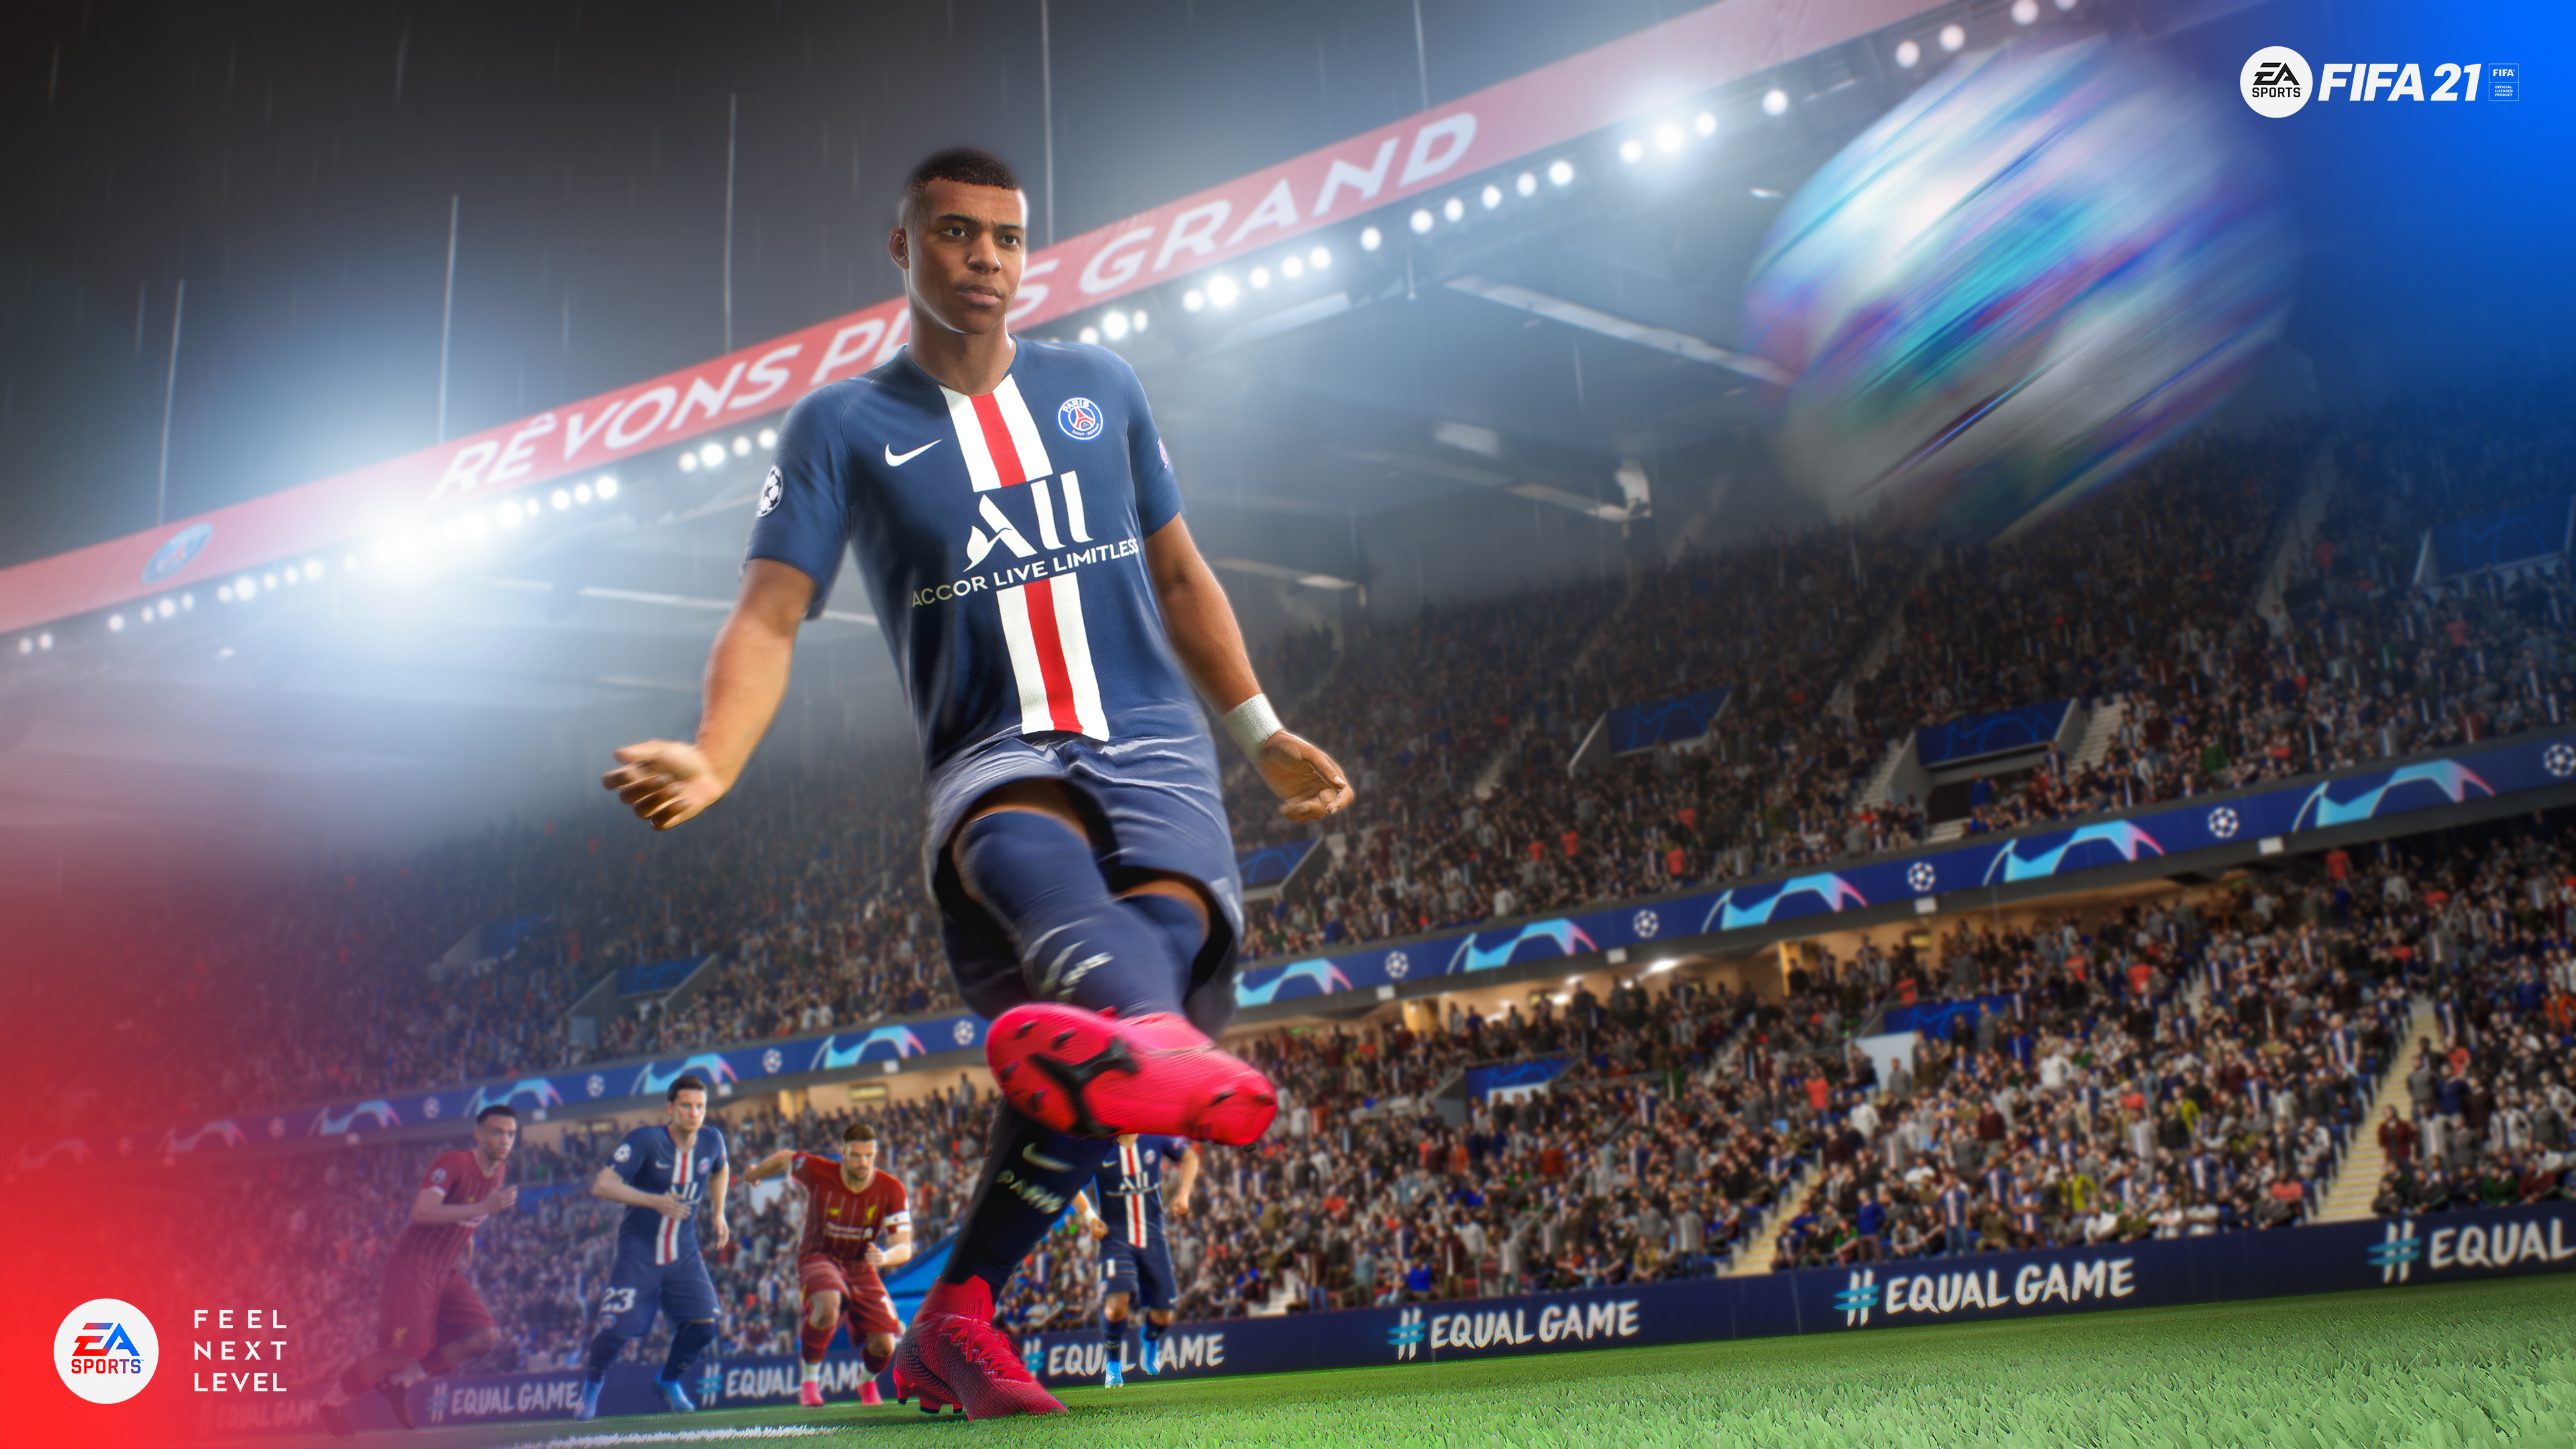 FIFA 21 Wallpaper, HD Games 4K Wallpapers, Images, Photos ...